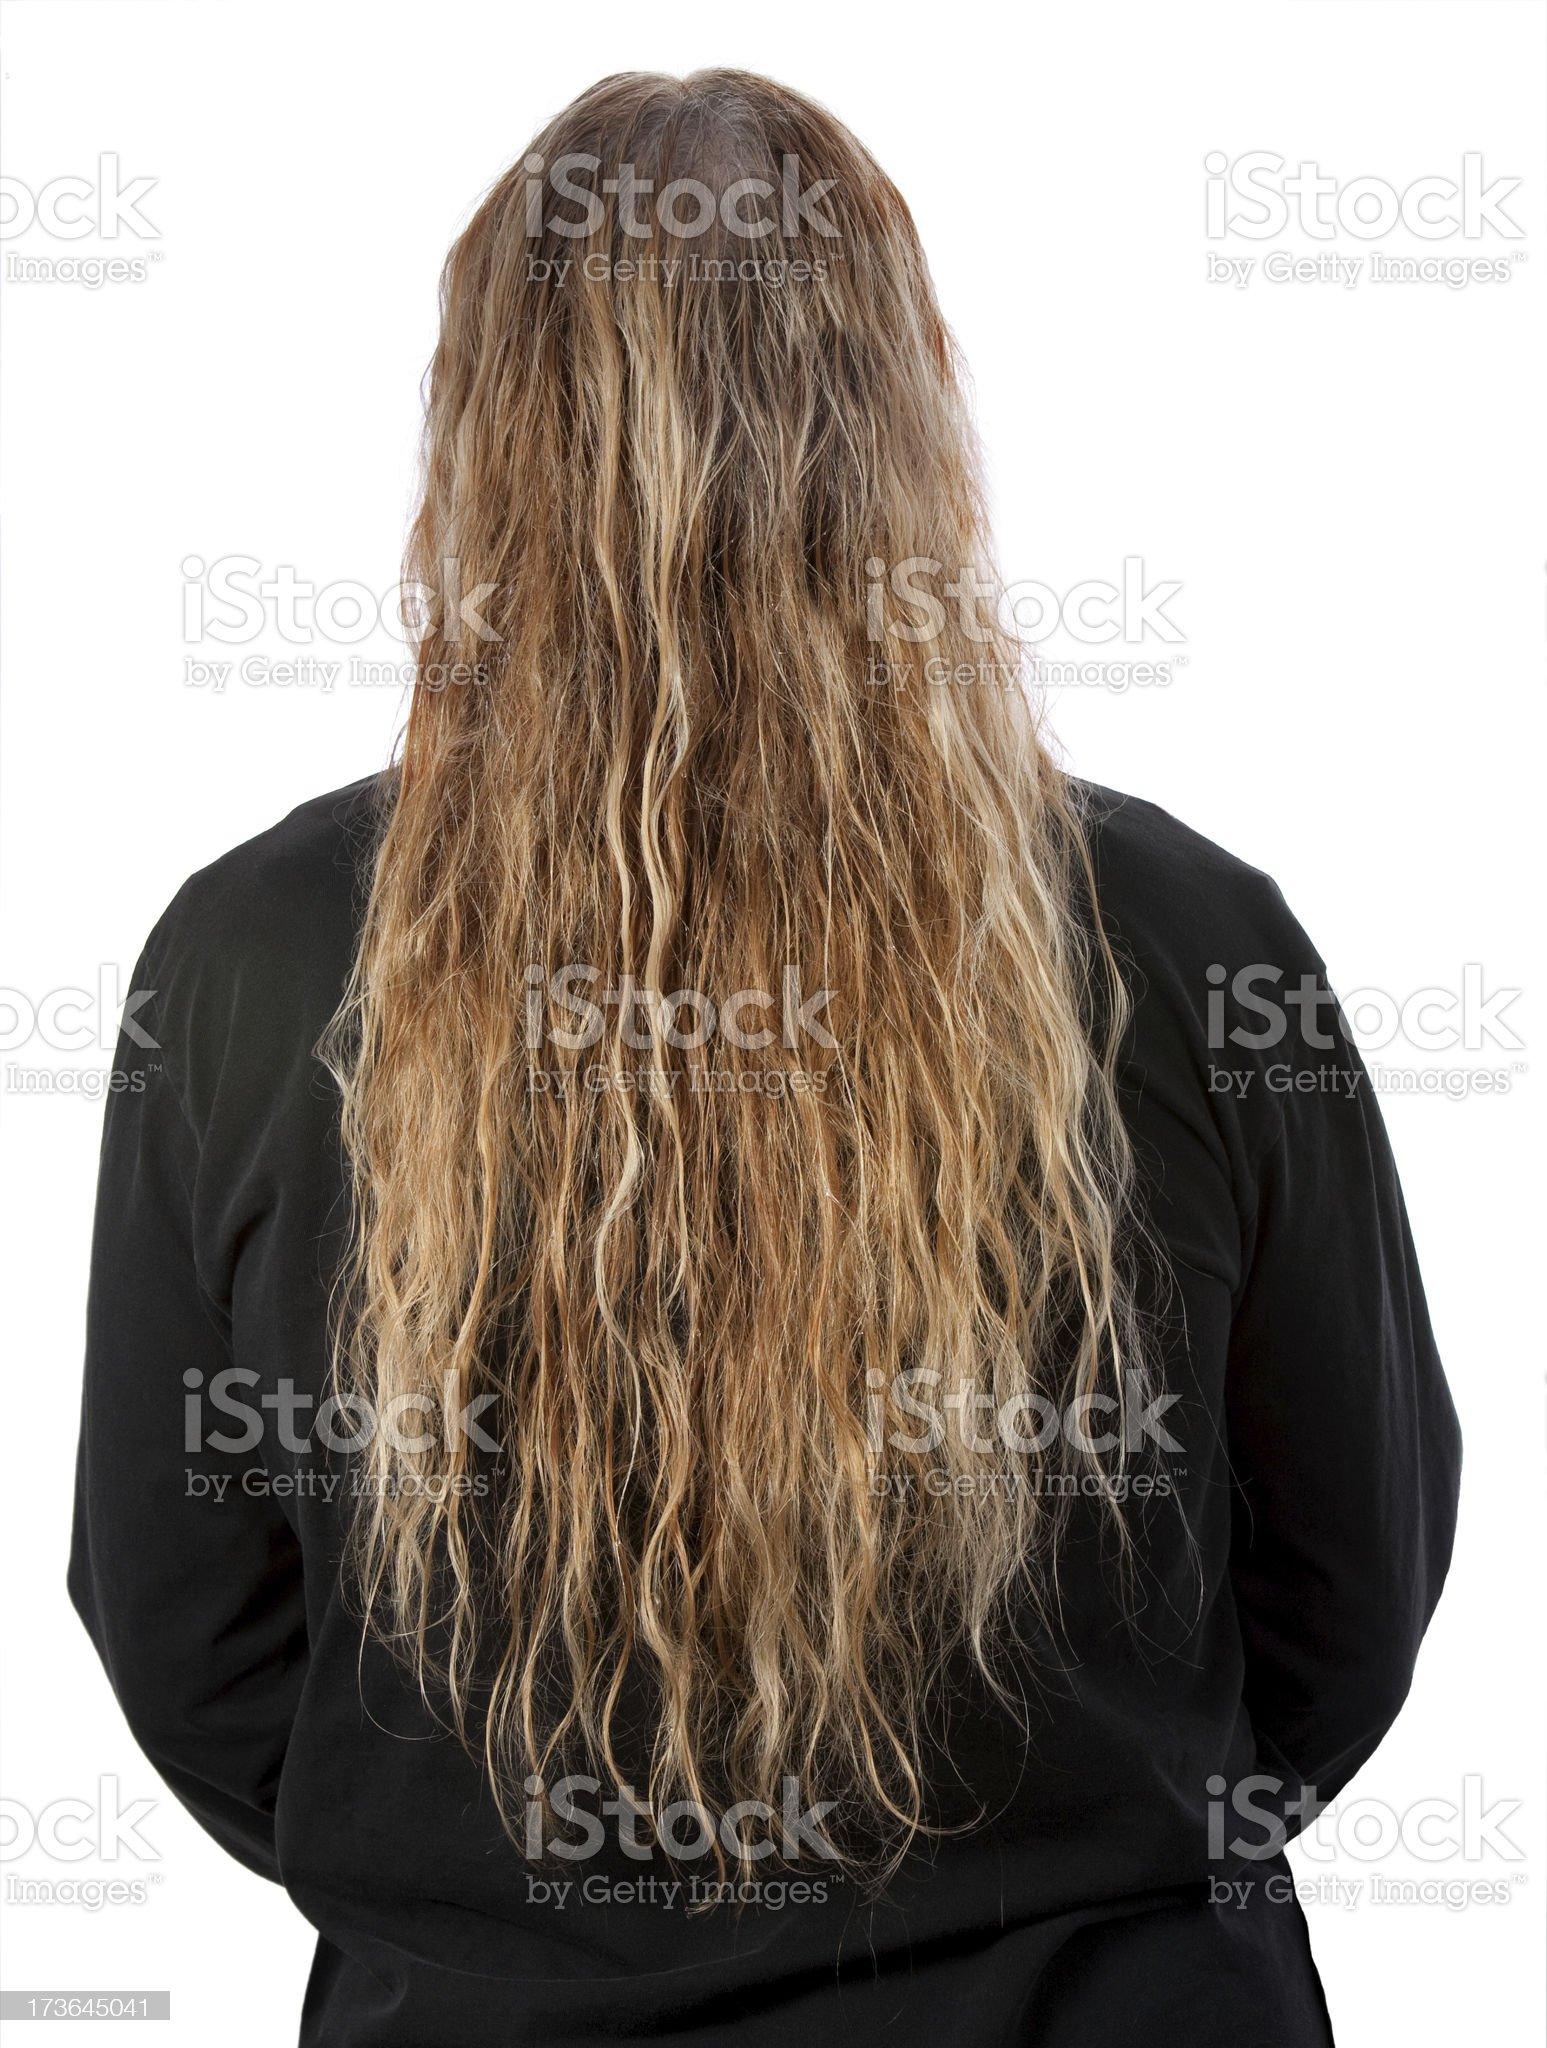 long wet tangled blonde hair royalty-free stock photo